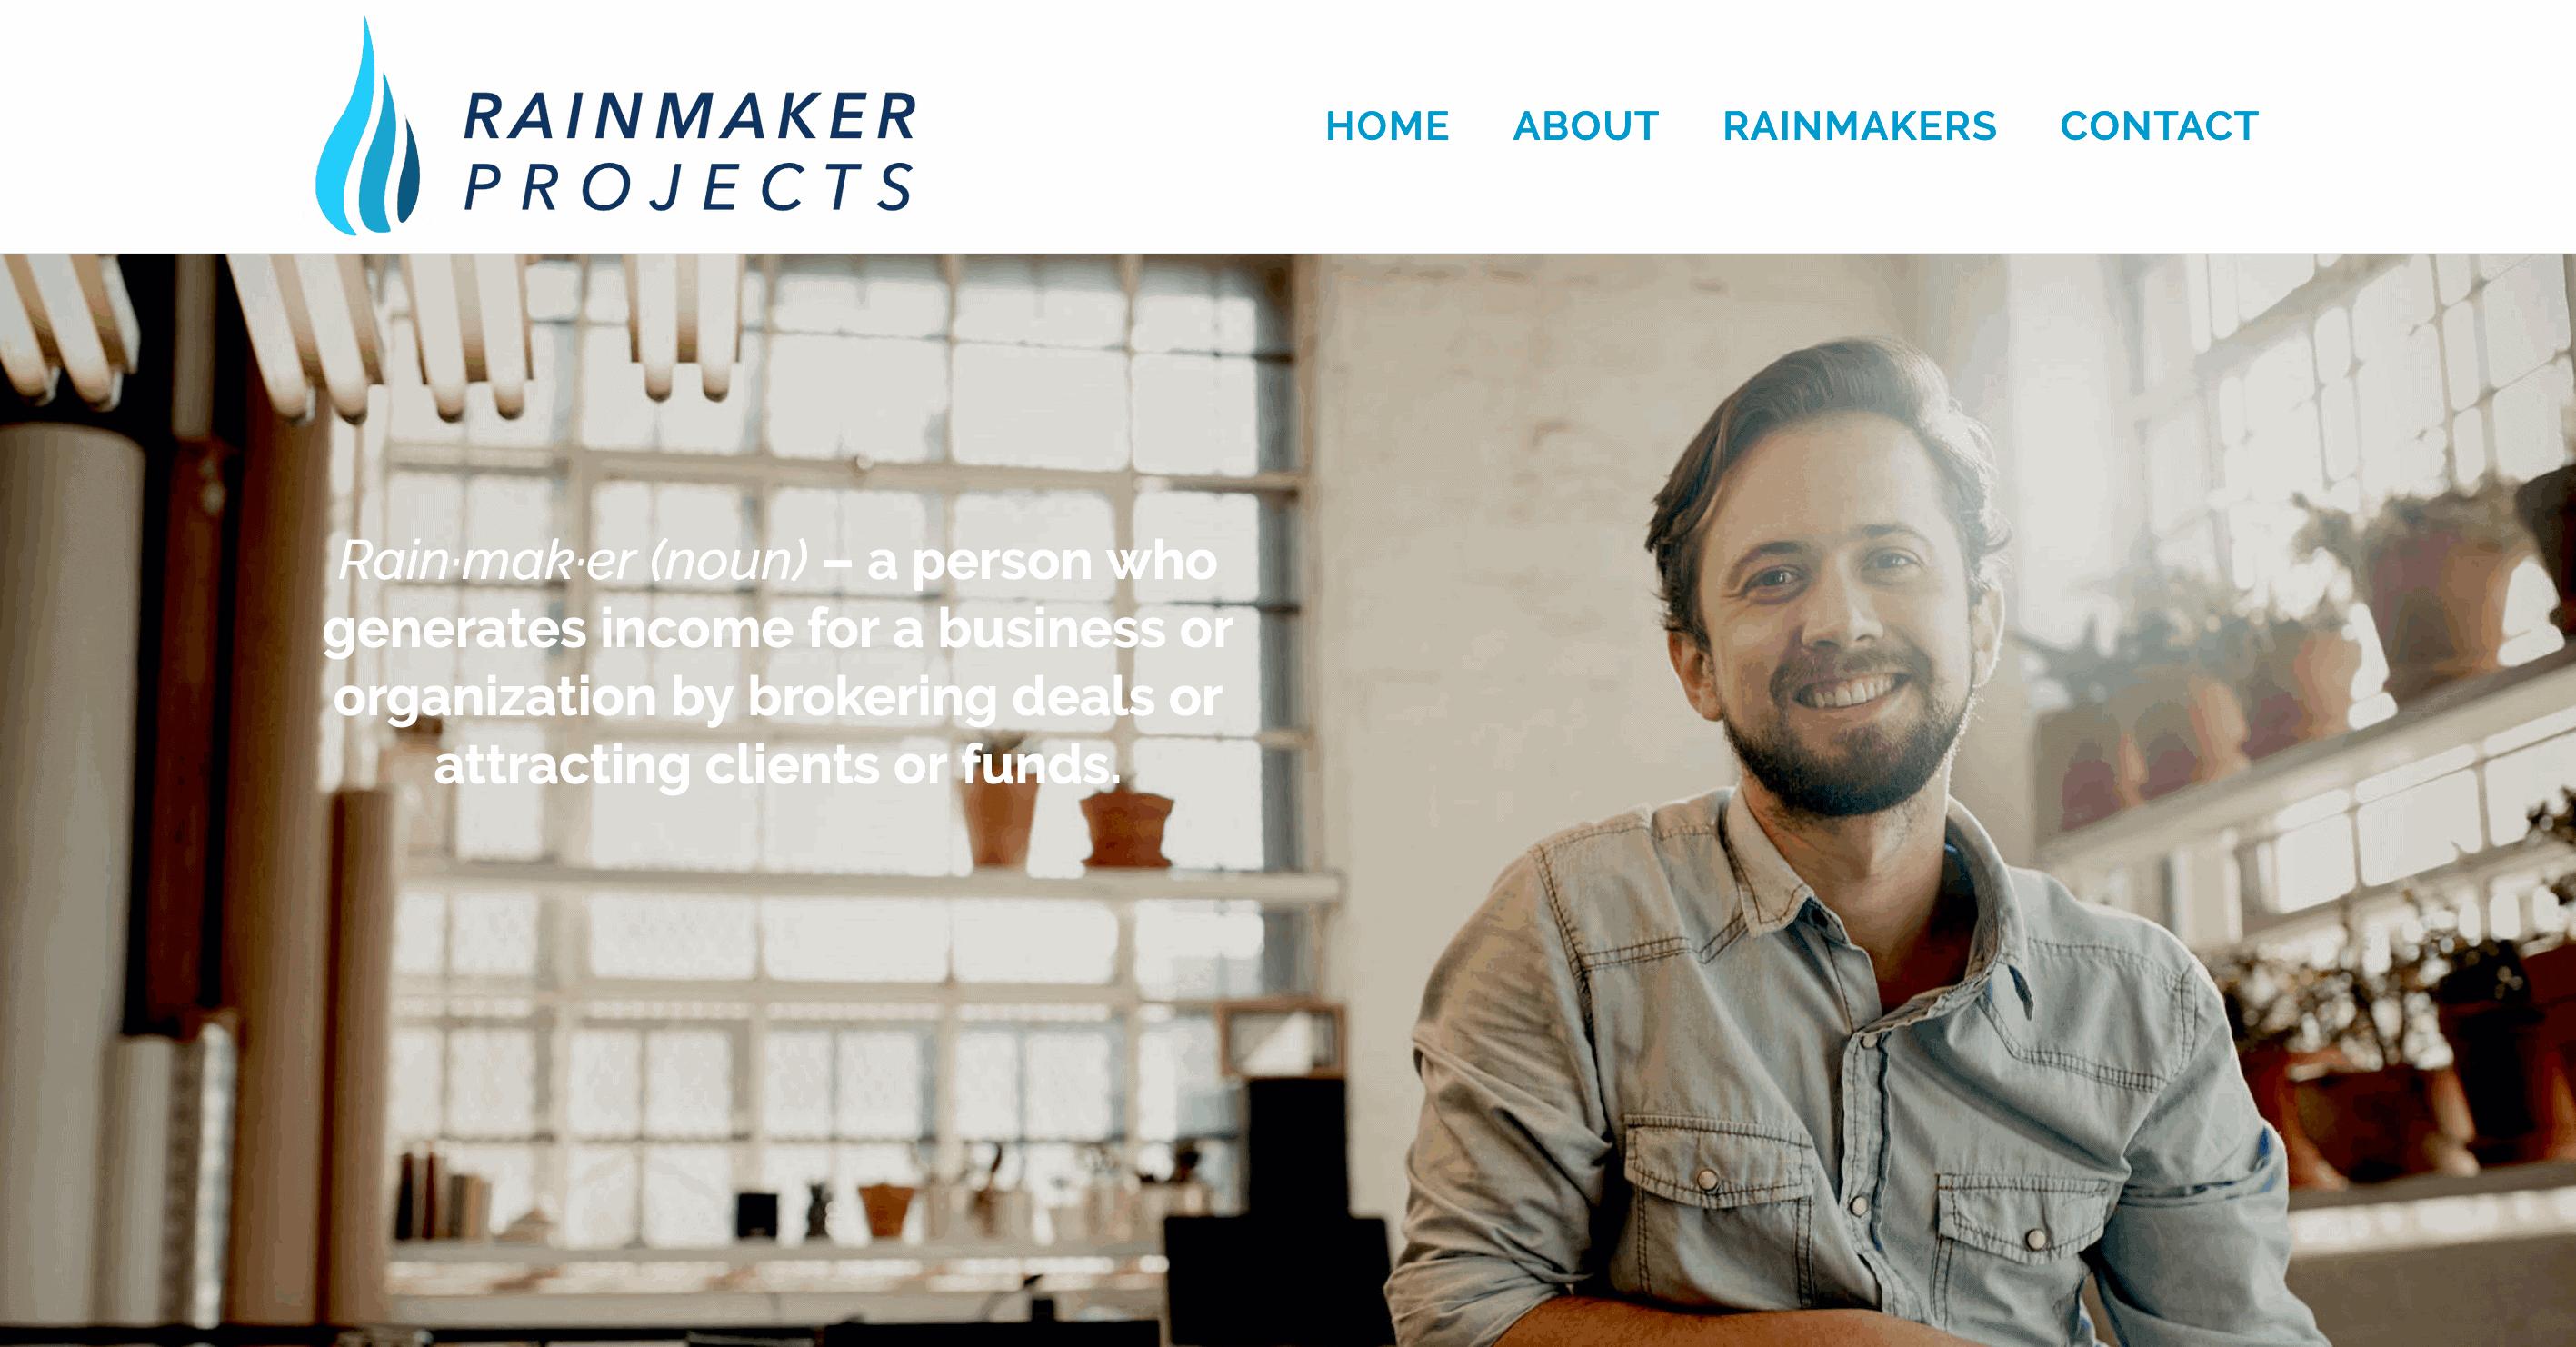 Rainmaker Projects